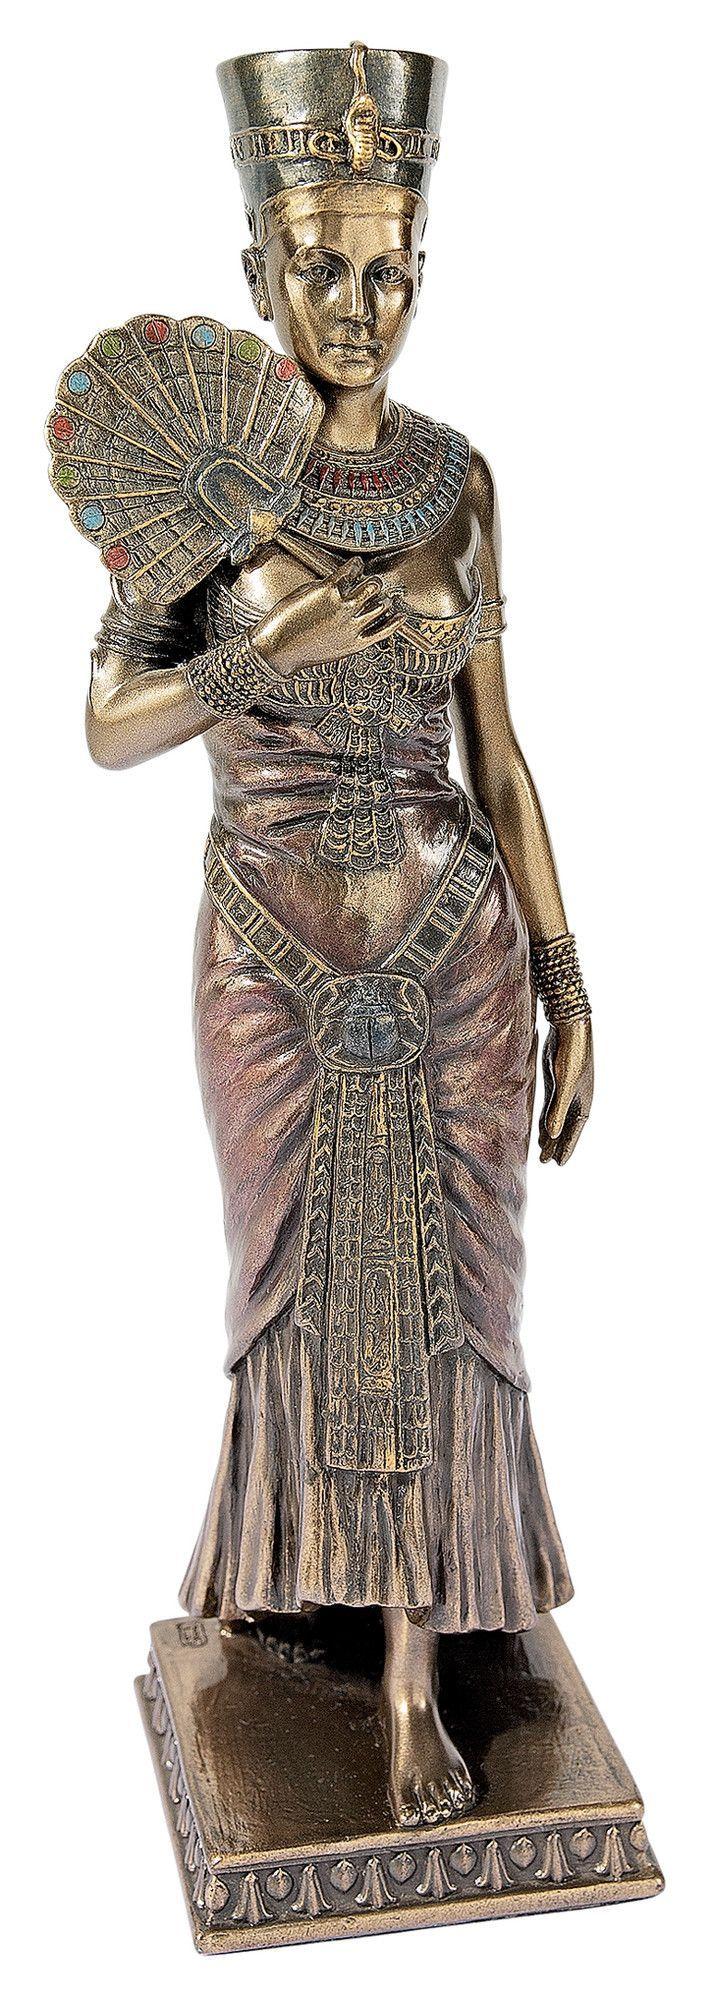 nefertiti queen of egypt An egyptian queen renowned for her beauty, nefertiti ruled alongside her husband, pharaoh akhenaten, during the 14th century bc nefertiti was perhaps one of.